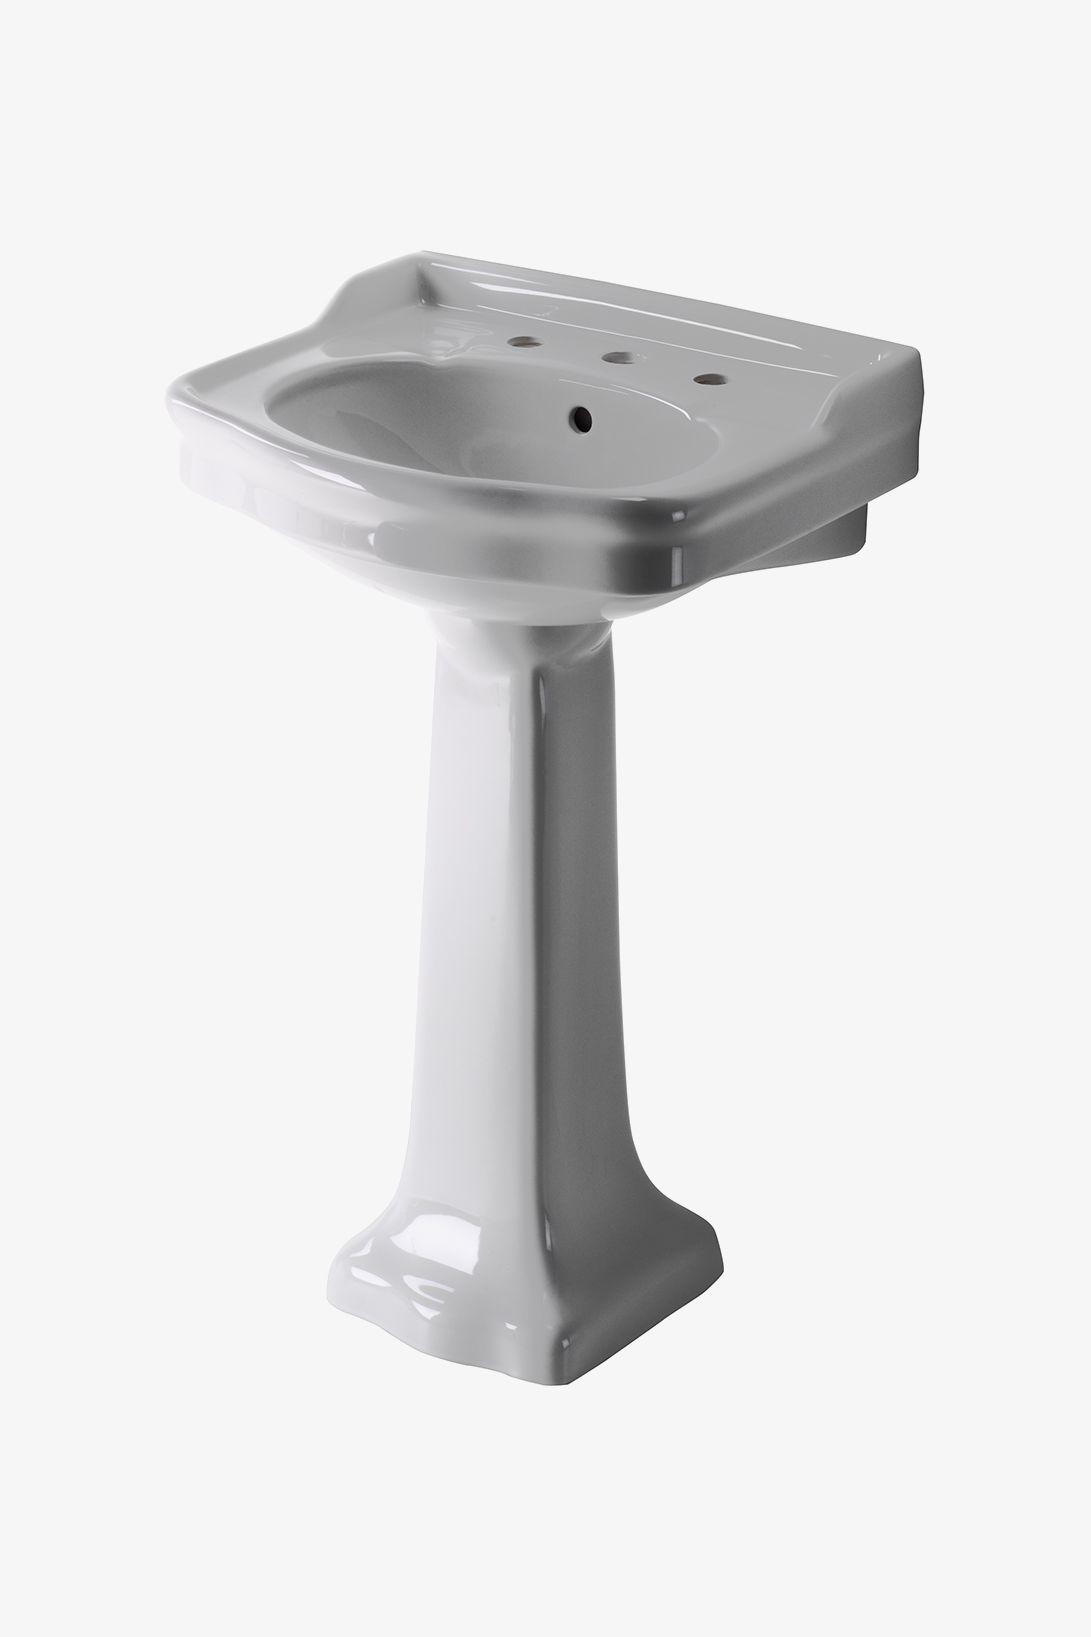 Discover palladio vitreous china pedestal lavatory sink